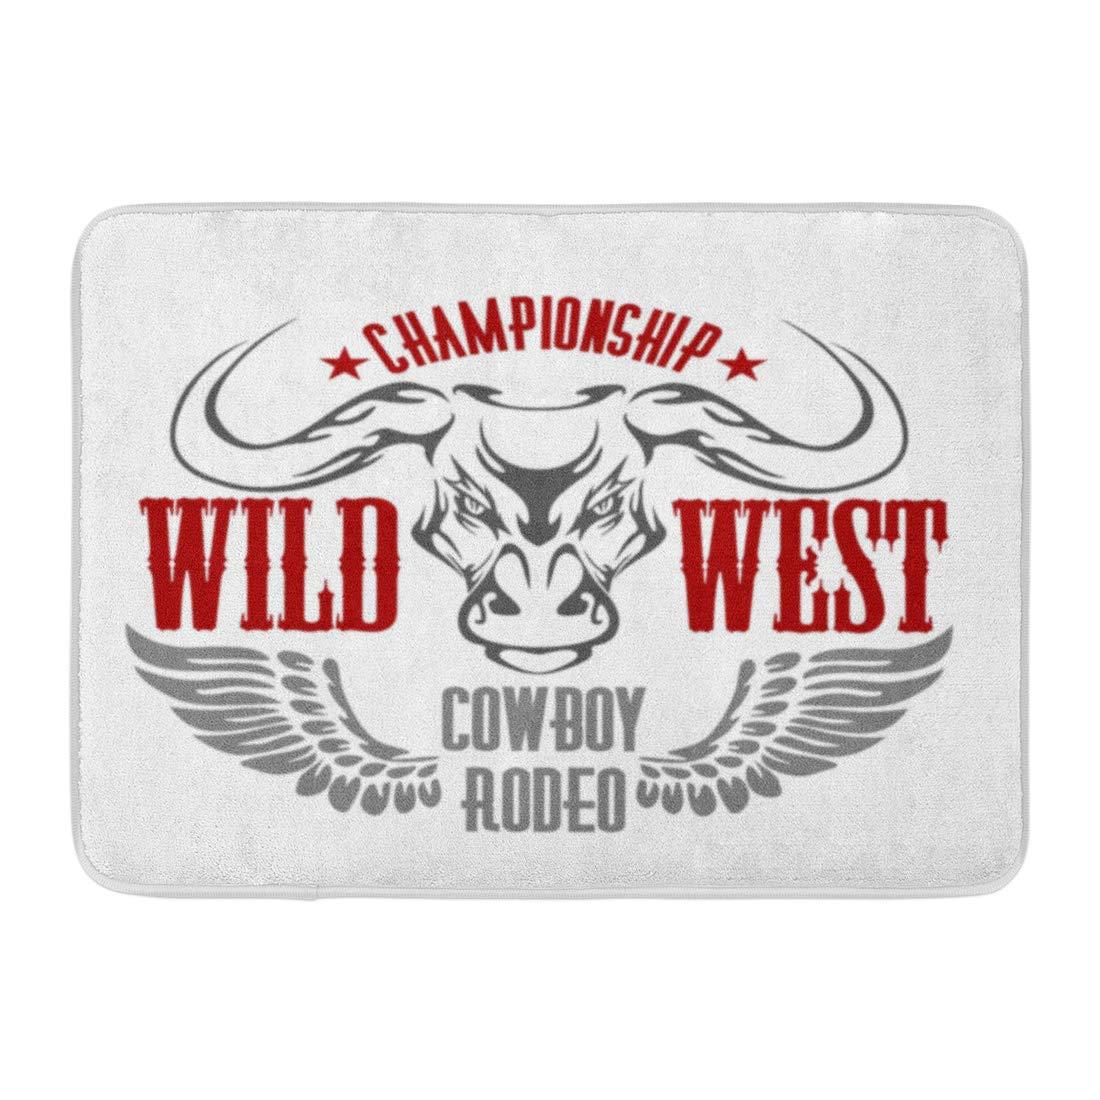 Aabagael Bath Mat Wings Red Western Wild West Championship Cowboy Rodeo Vintage Artwork for Wear Texas America Bathroom Decor Rug 16'' x 24''